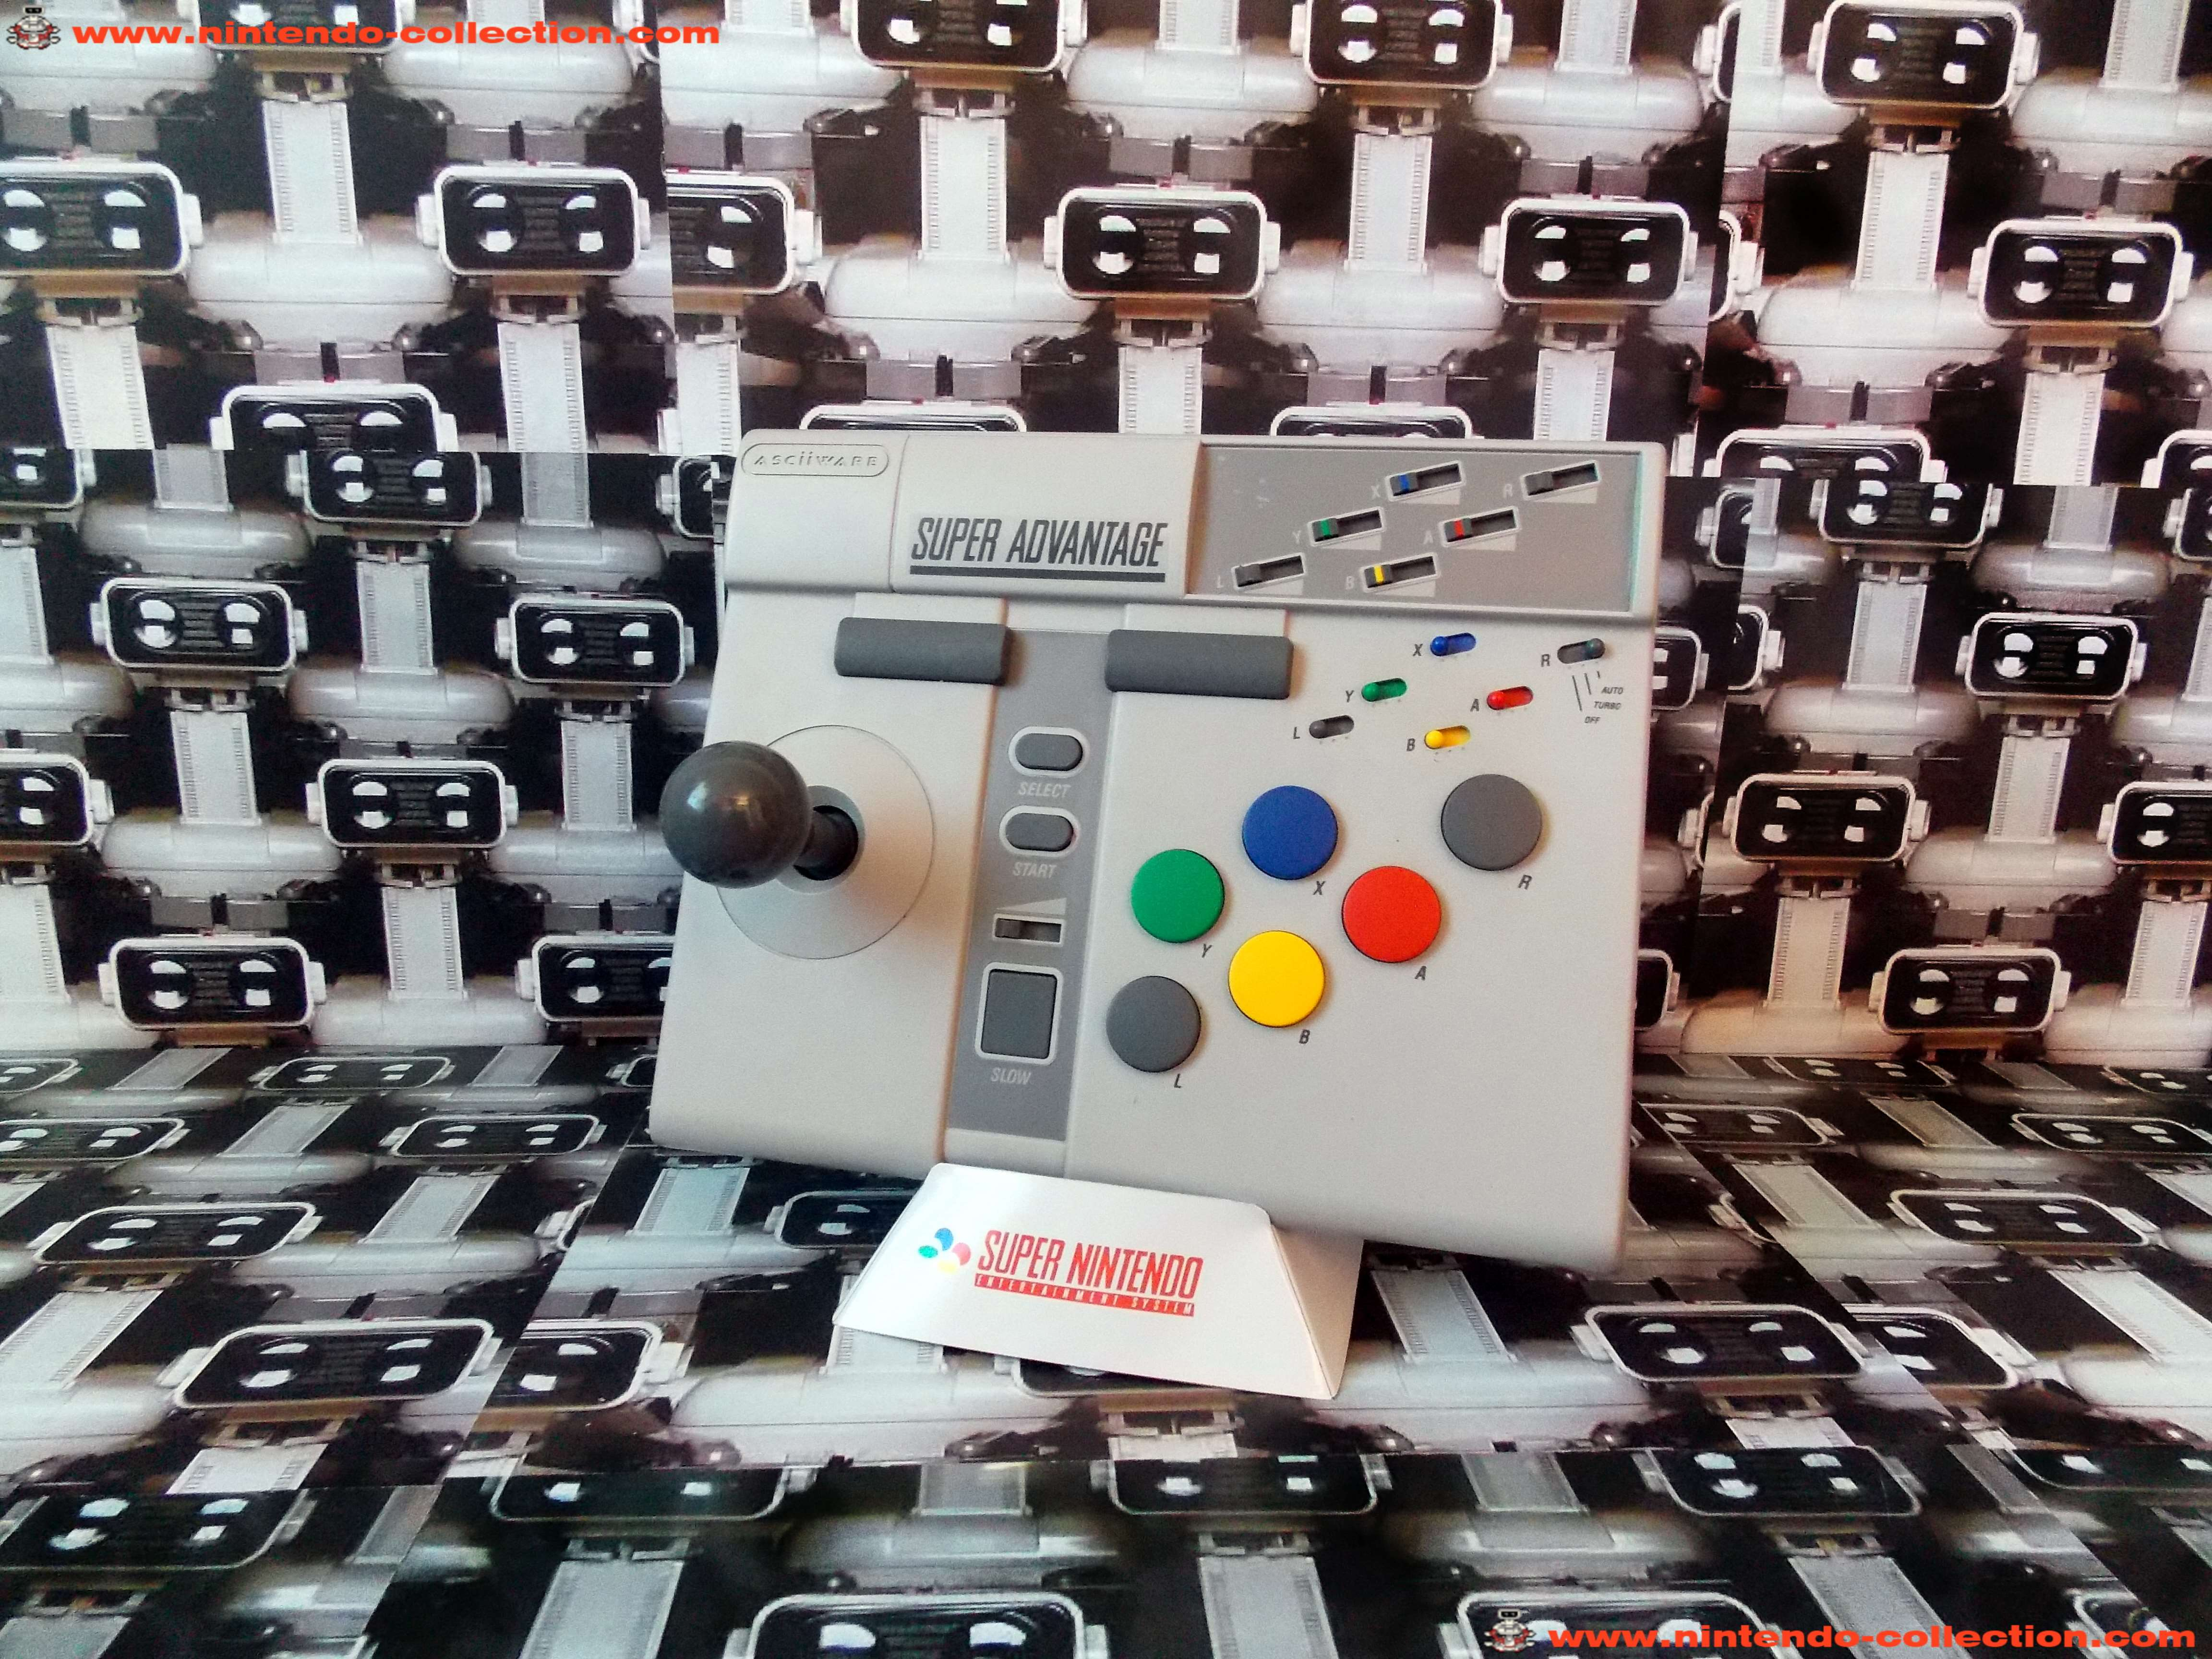 www.nintendo-collection.com - Super Nintendo SNES Super Advantage